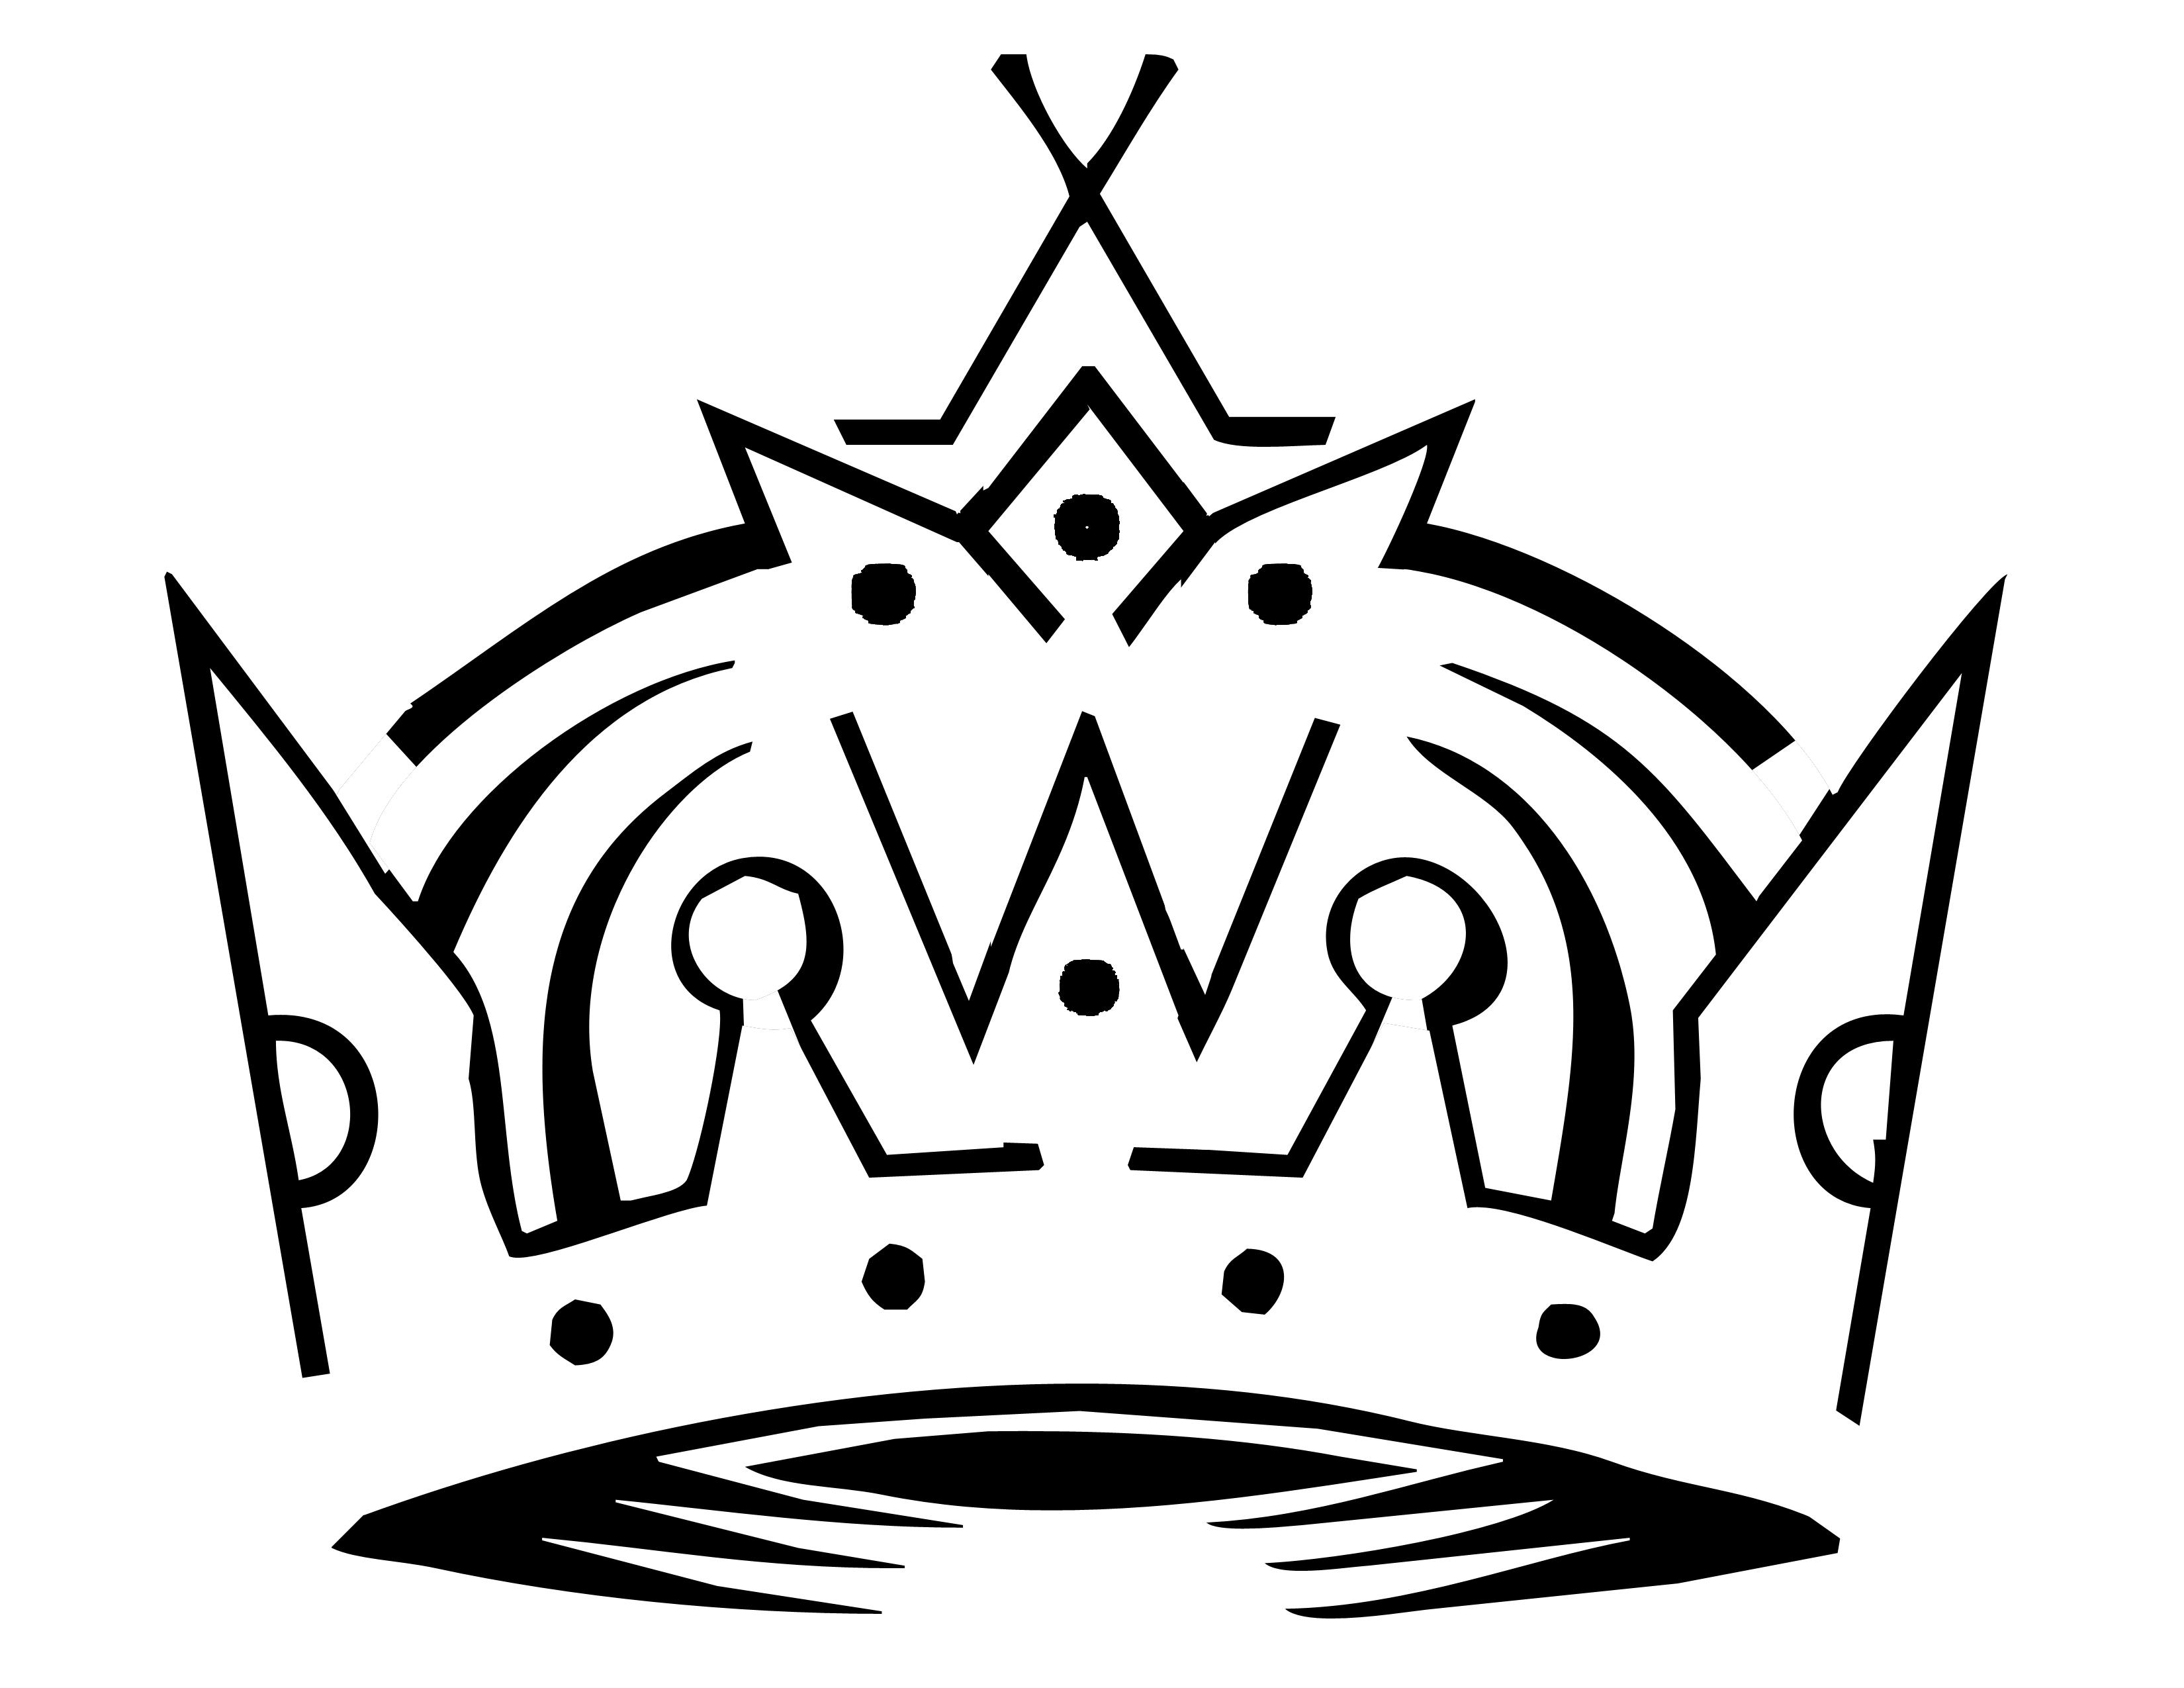 Free King Crown Logo, Download Free Clip Art, Free Clip Art.